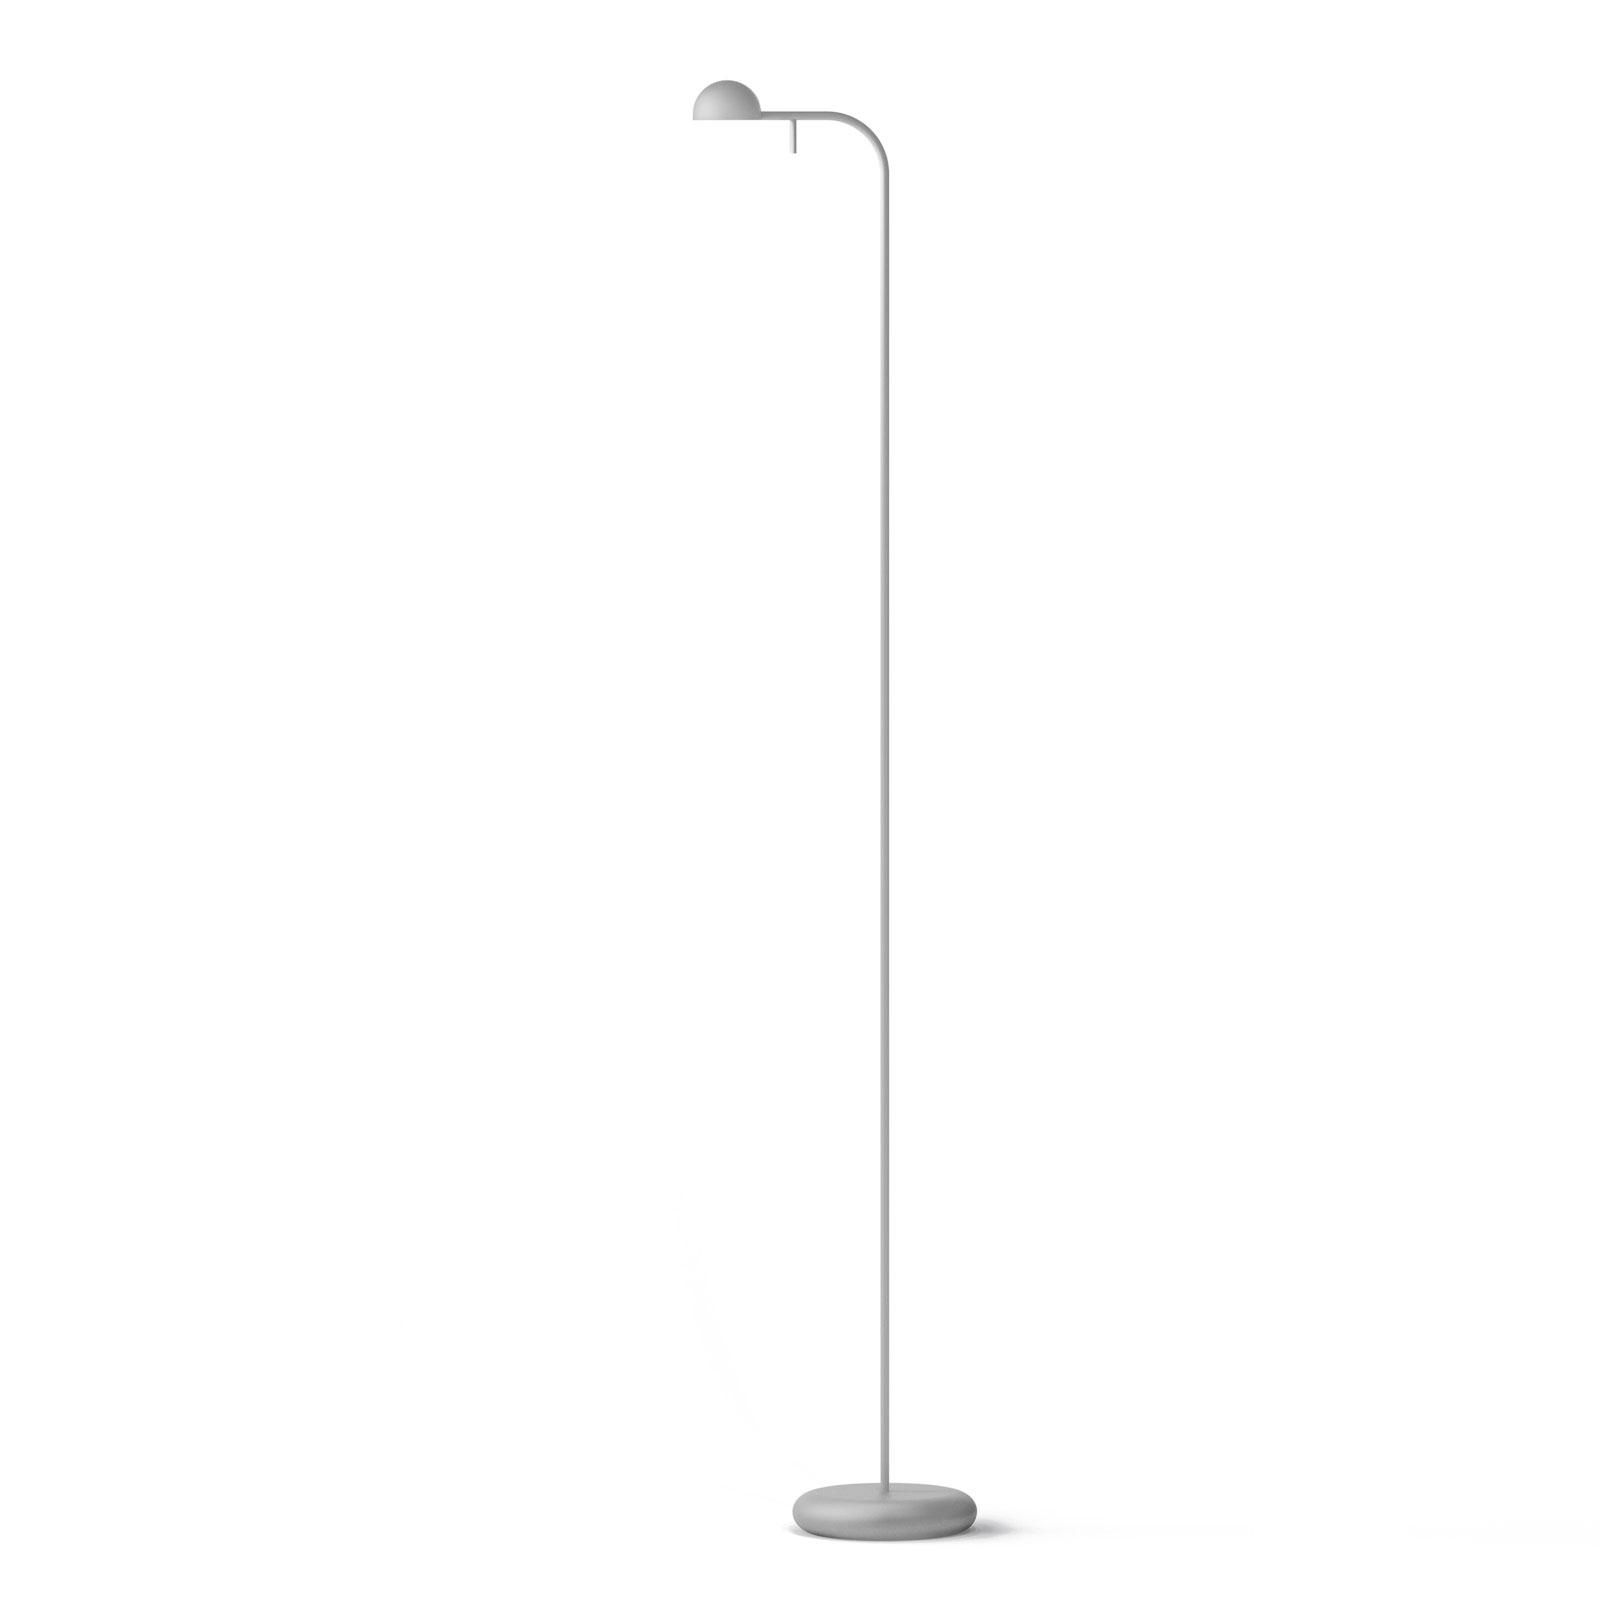 Vibia Pin 1660 lampadaire LED, 125cm, blanc